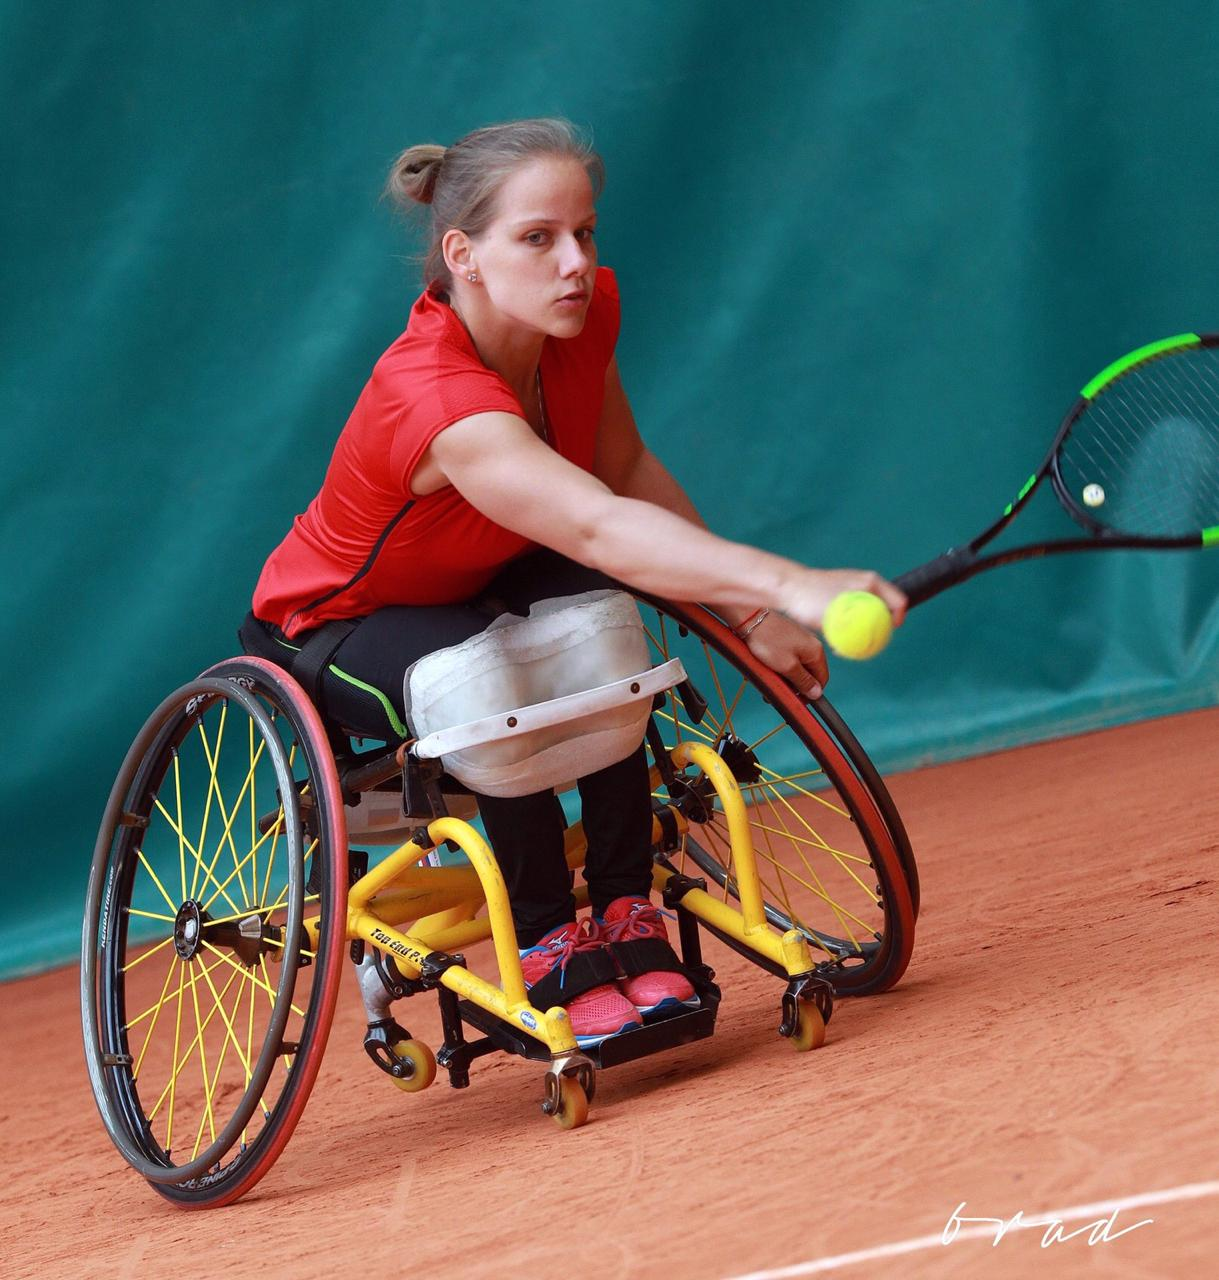 Виктория Львова завоевала бронзовые медали на 2-х международных турнирах по теннису на колясках во Франции